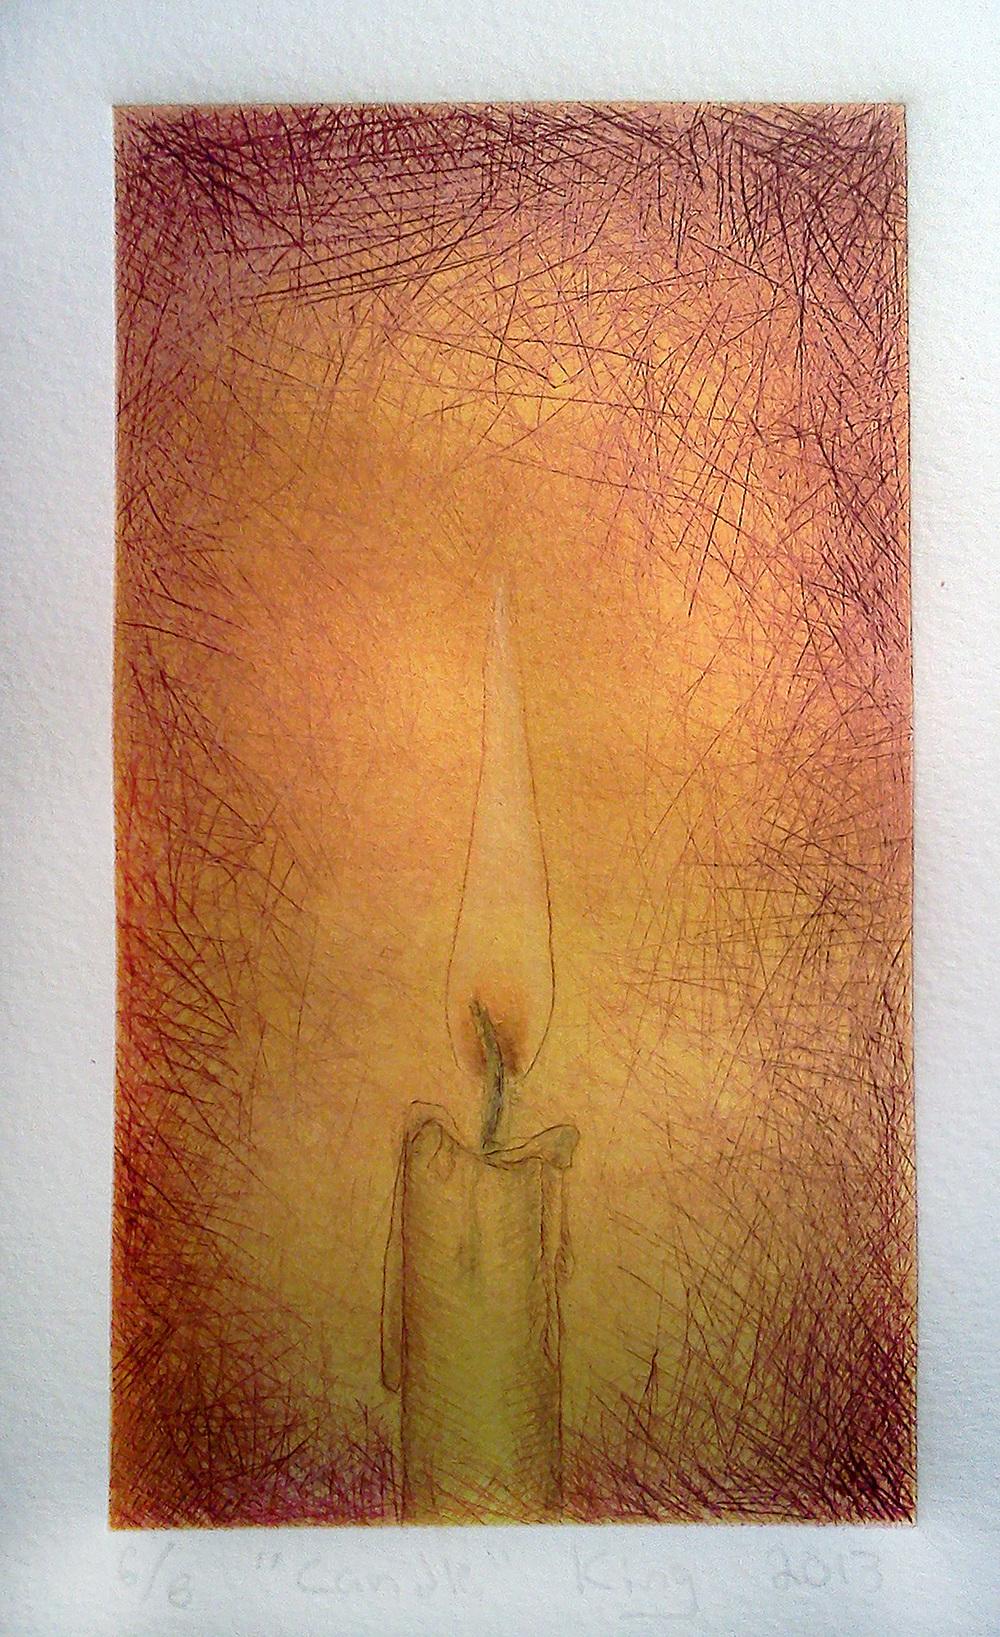 Candle study